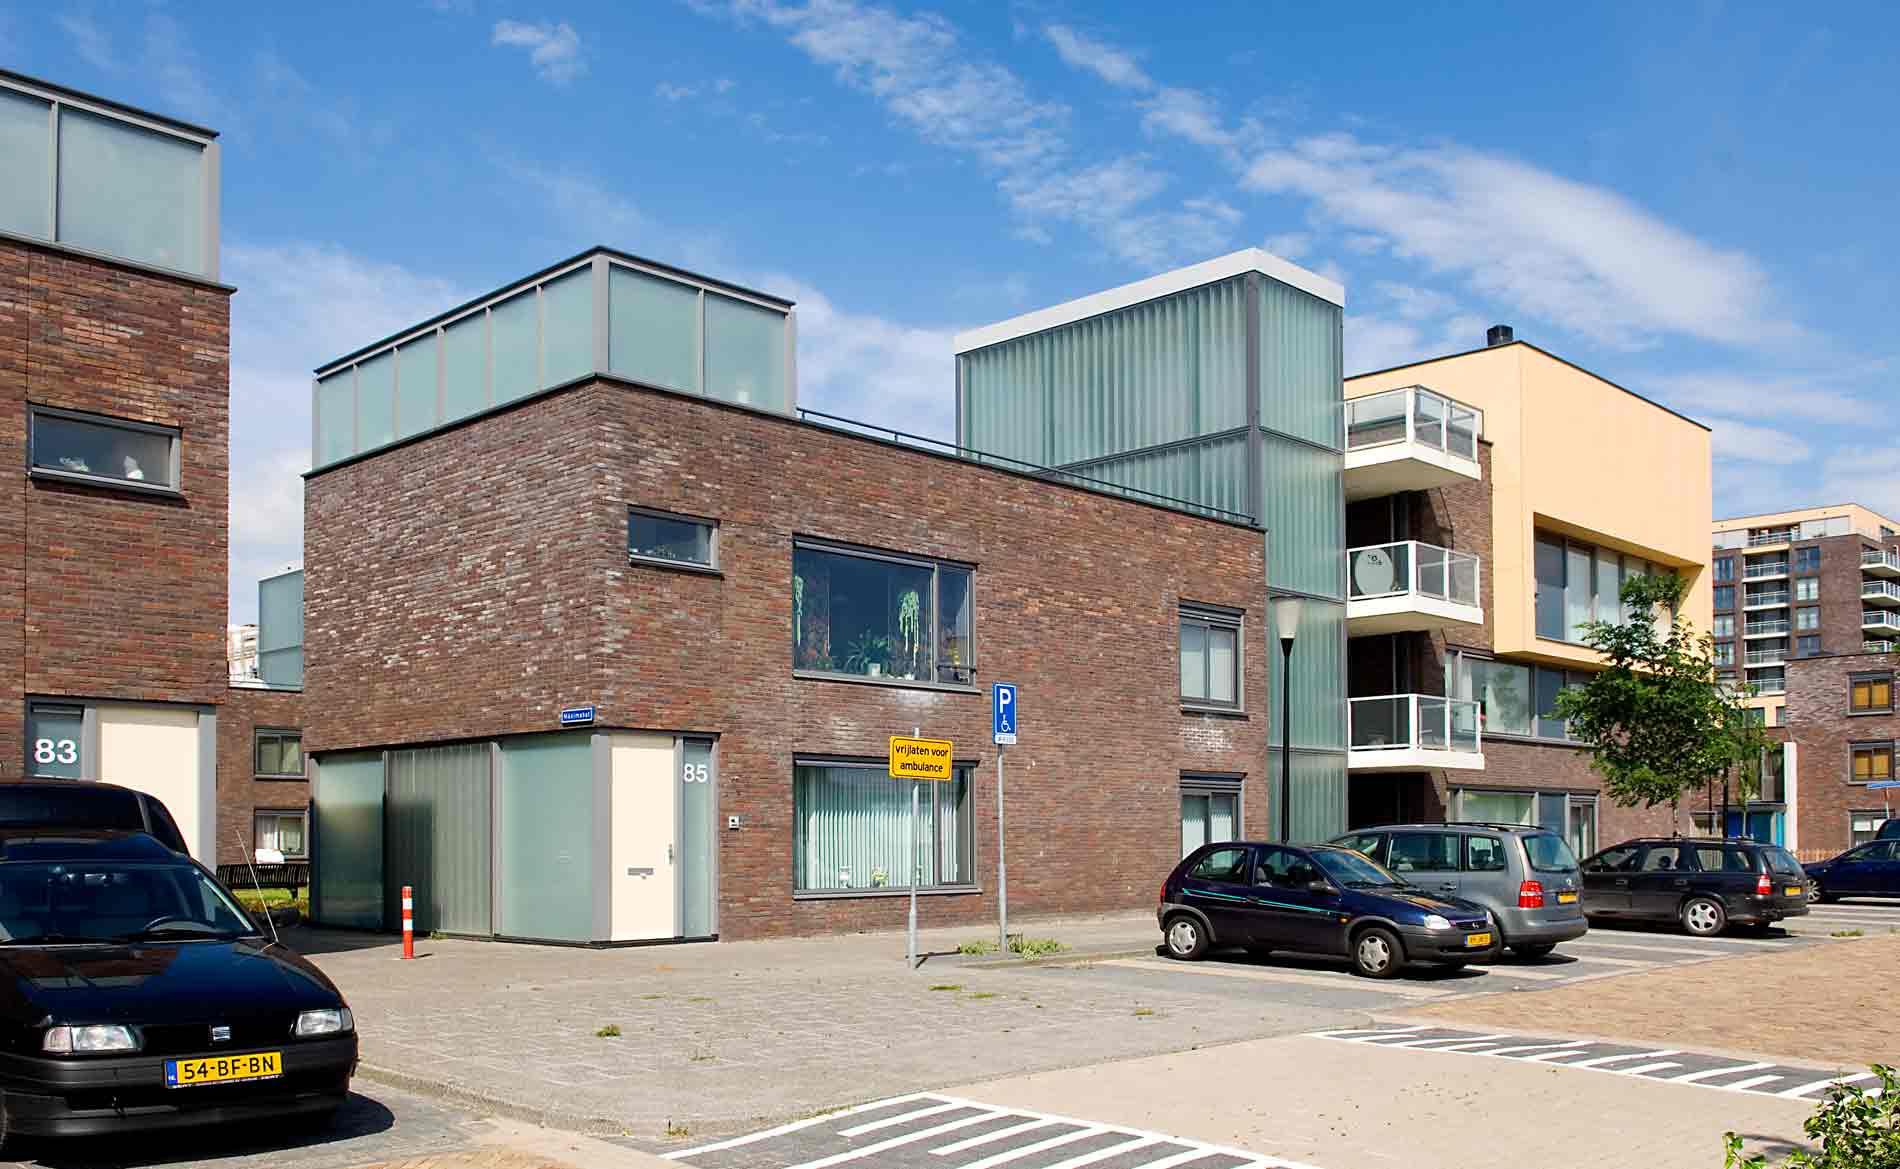 Prinsenhof Beverwijk Herstructurering wonen BBHD architecten Pré Wonen